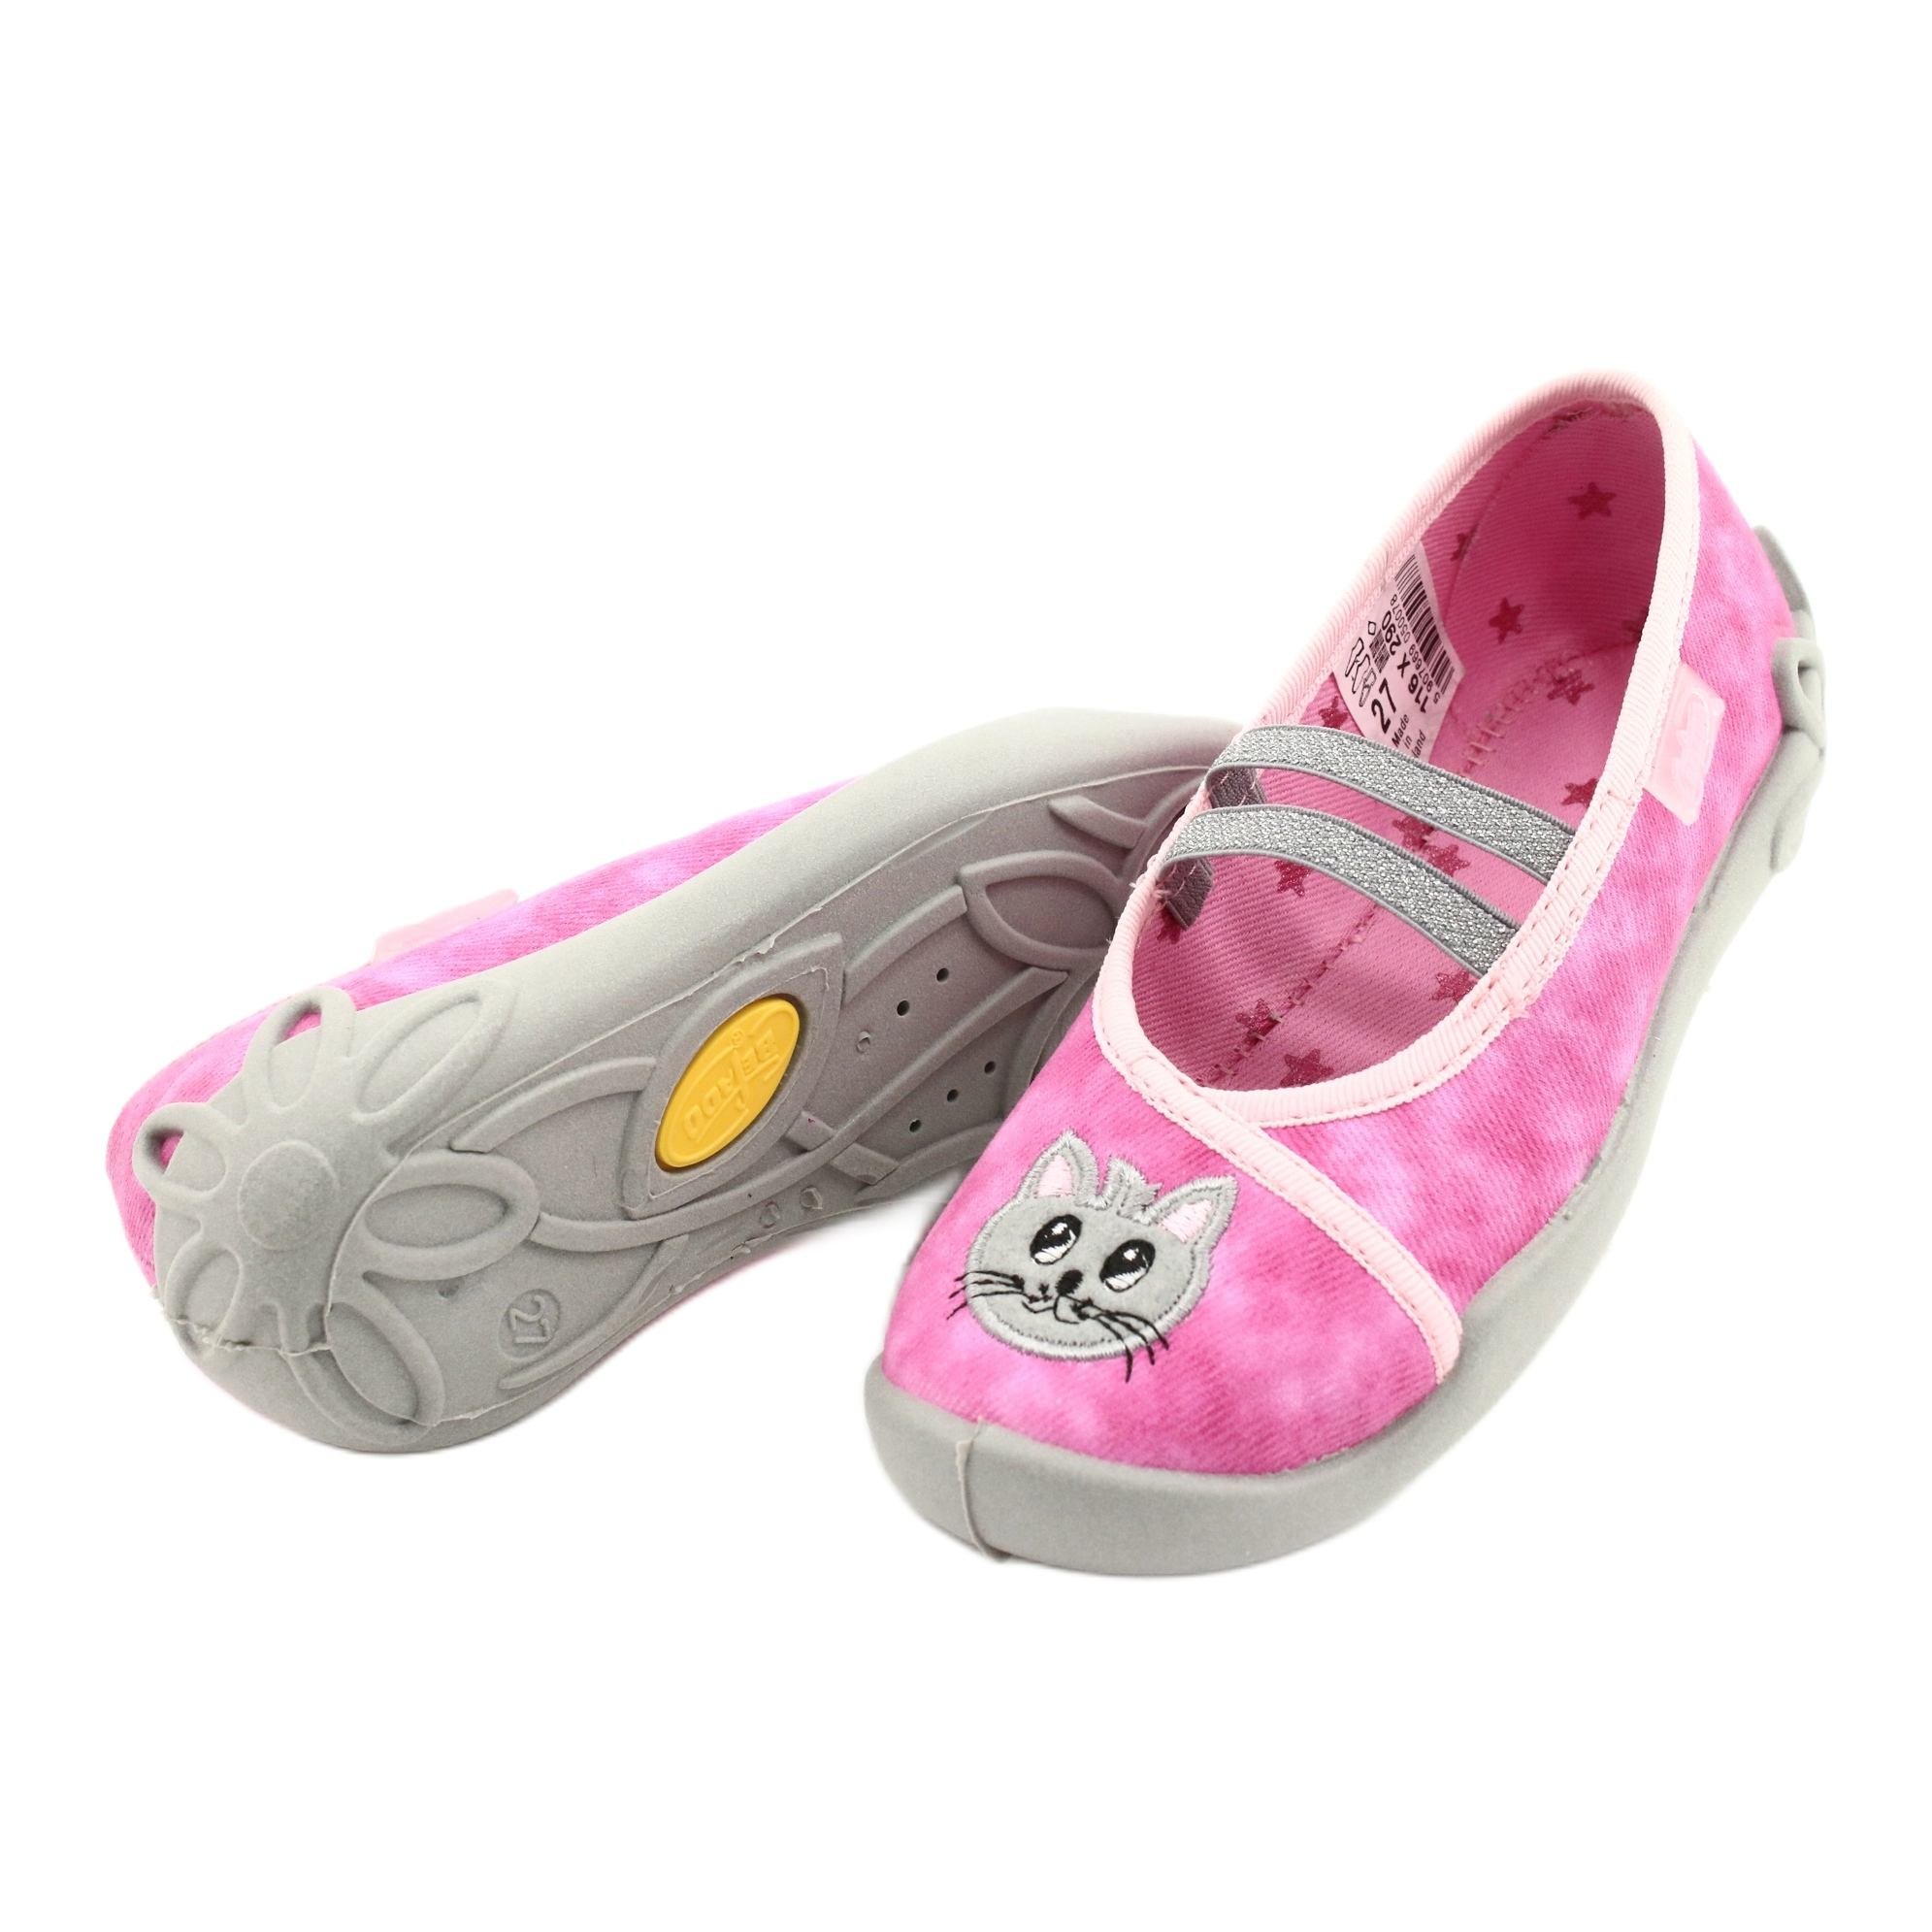 miniatura 5 - Scarpe per bambini Befado 116X290 rosa argento grigio